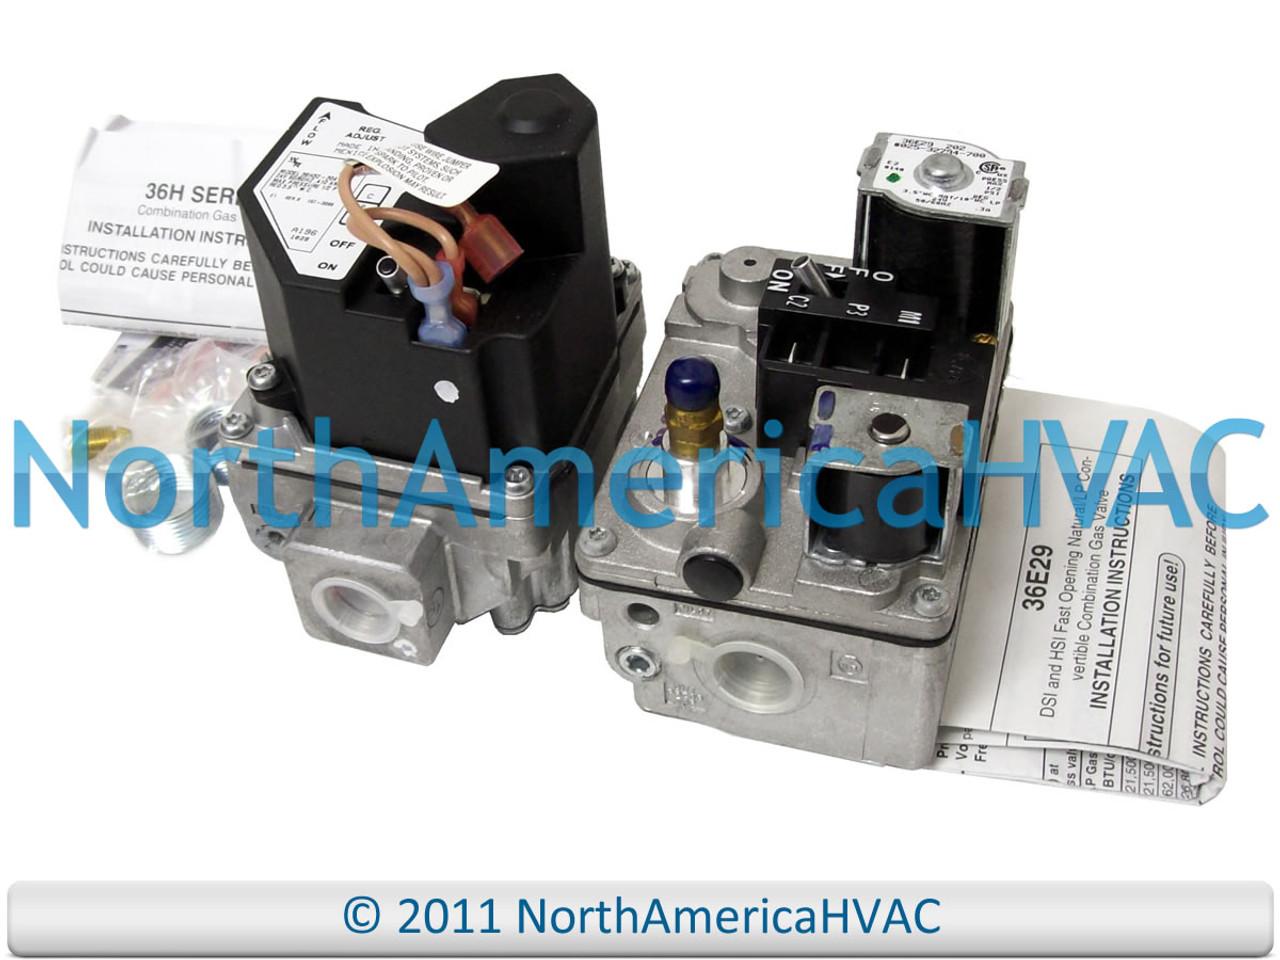 Intertherm Nordyne Miller Furnace Control Gas Valve VR8205S2890 VR8205S 2890